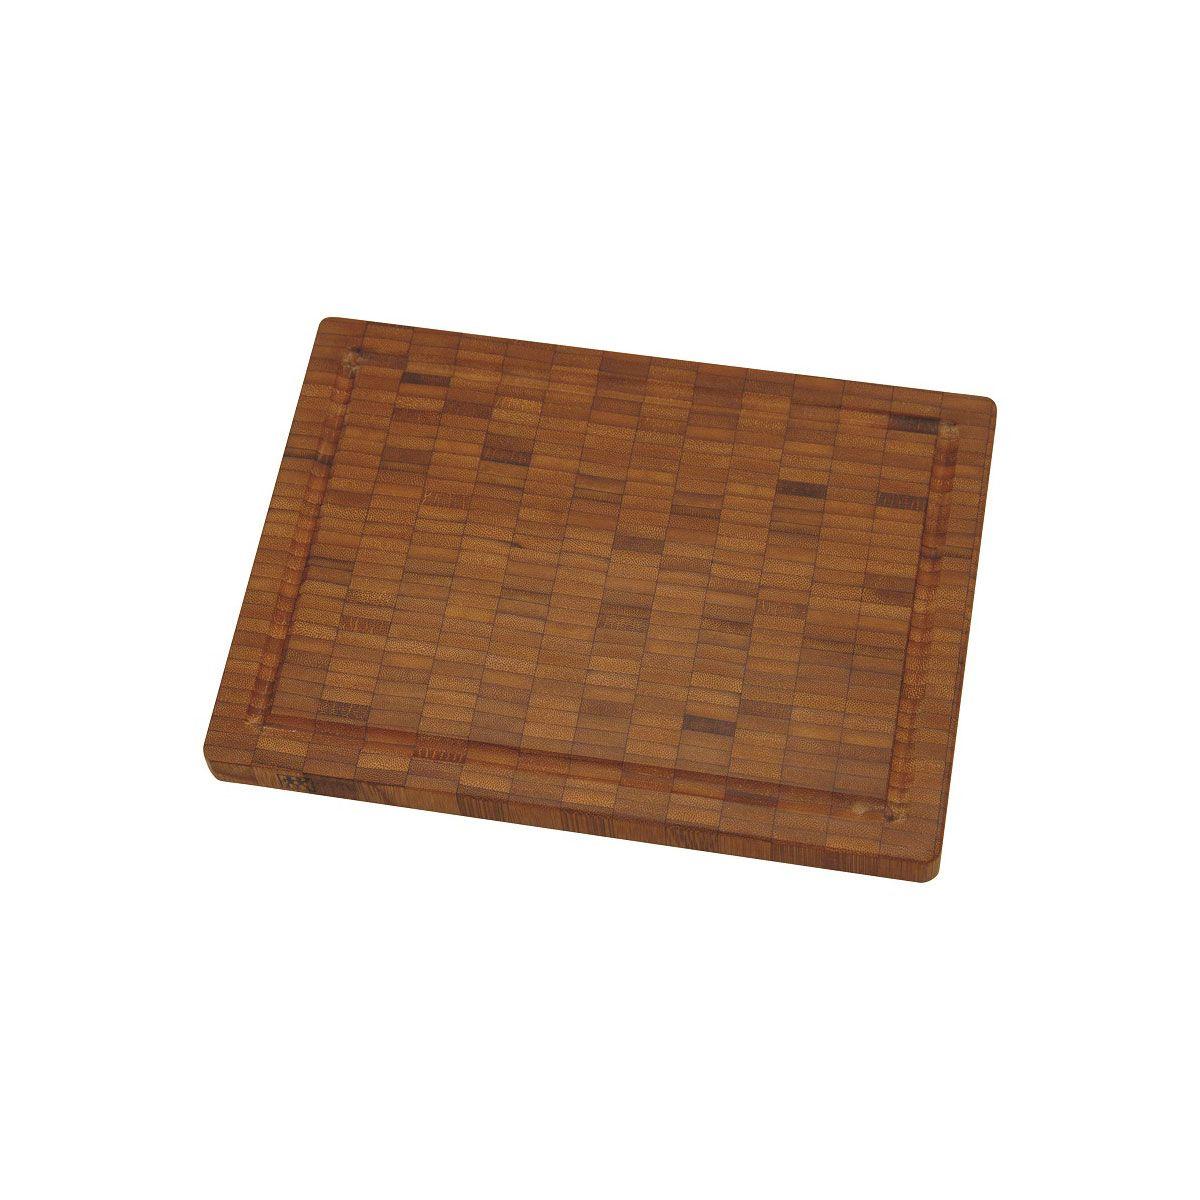 Tabua Para Cortar Em Bamboo Zwilling Pequena 25x2x18,5cm